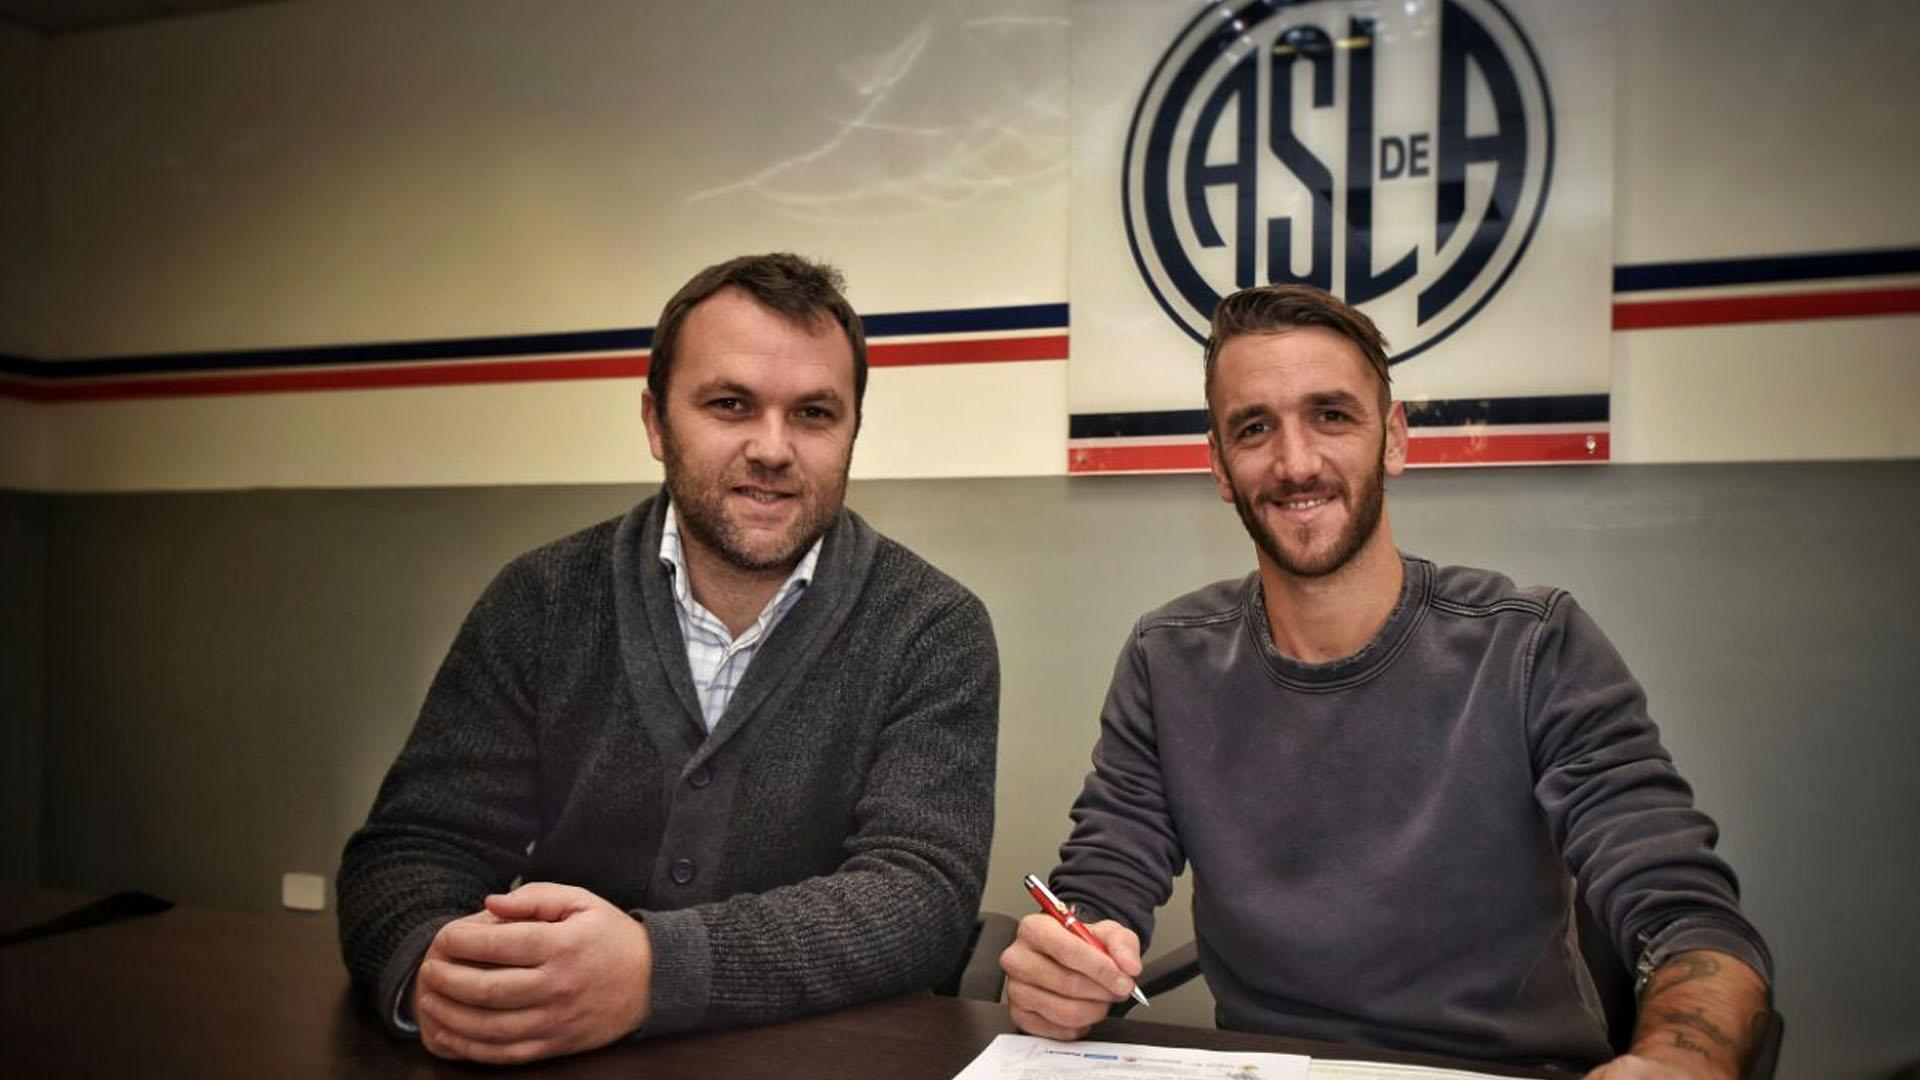 Romeo fue manager de San Lorenzo hasta fines del 2017